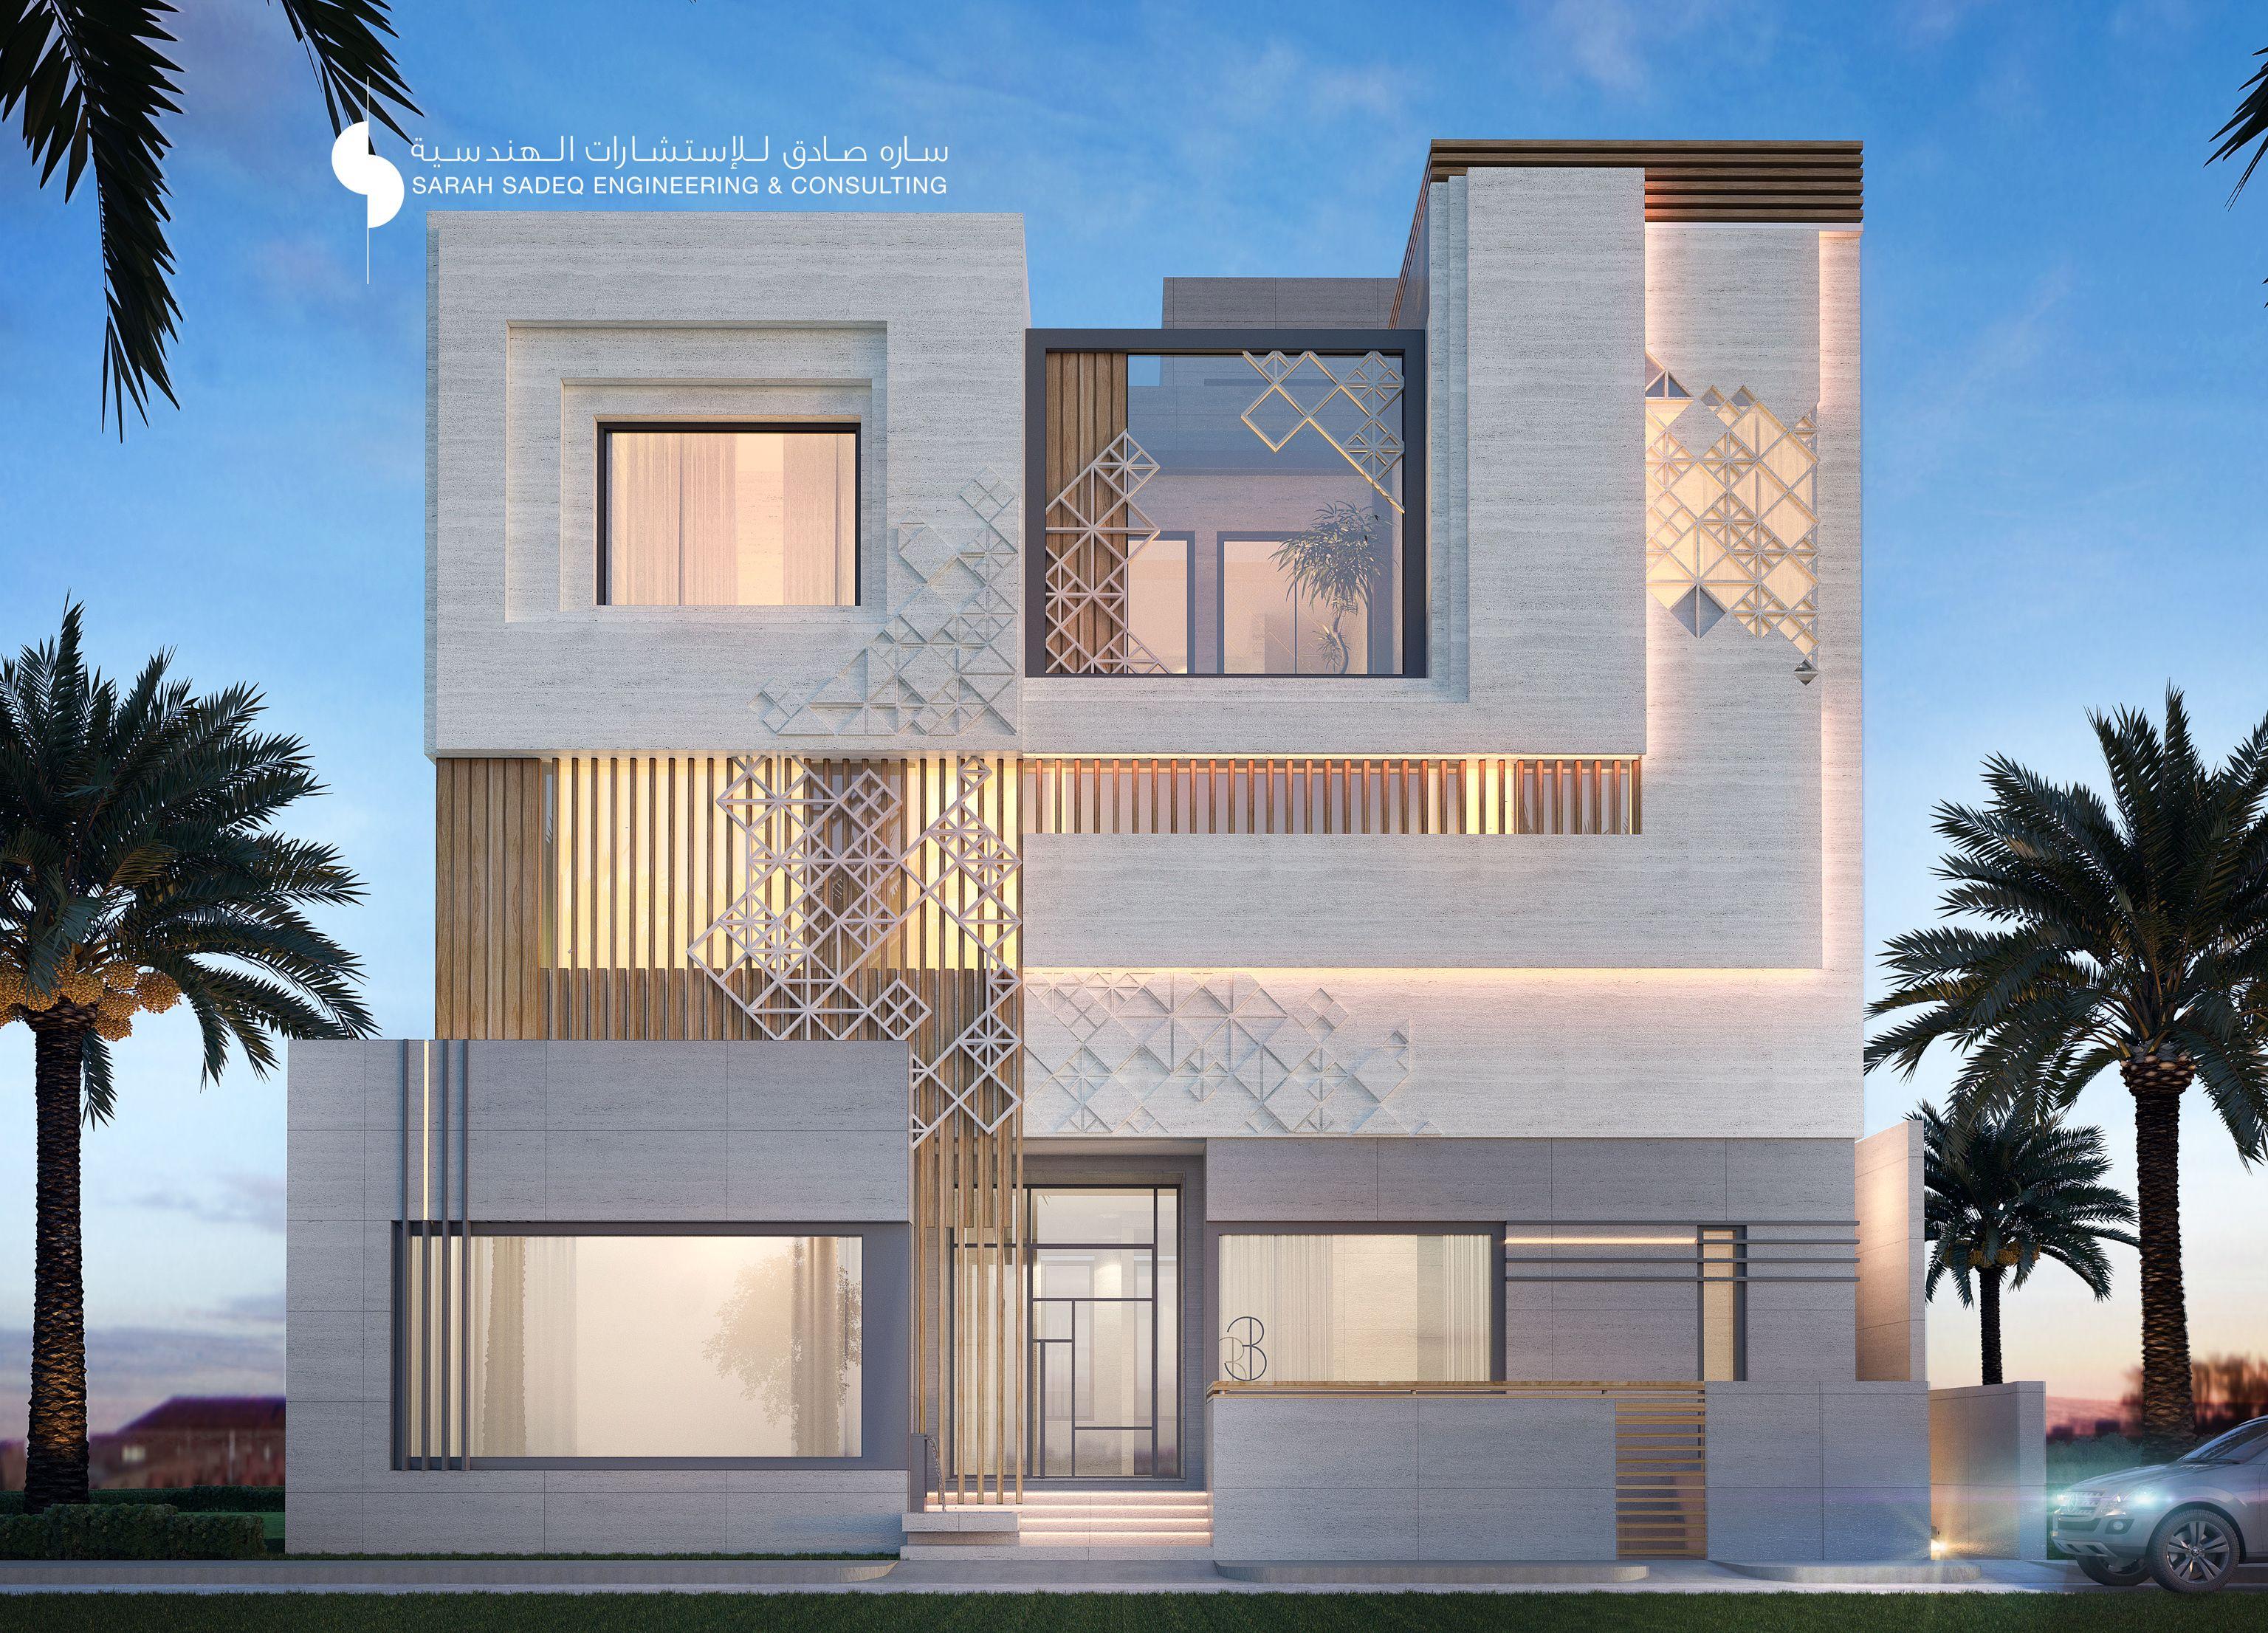 Private Villa Kuwait 400 Sarah Sadeq Architects